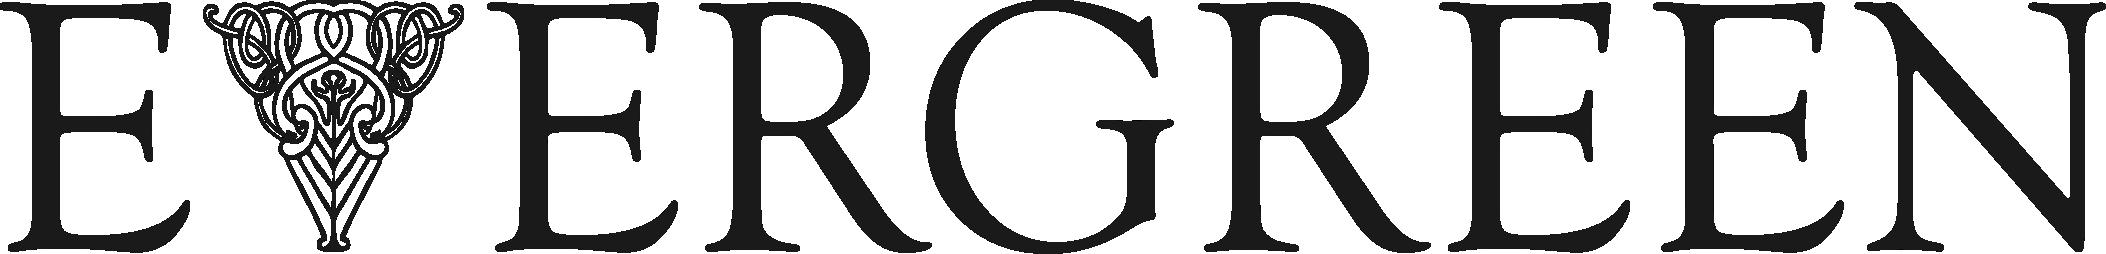 logo_bl_solo.png